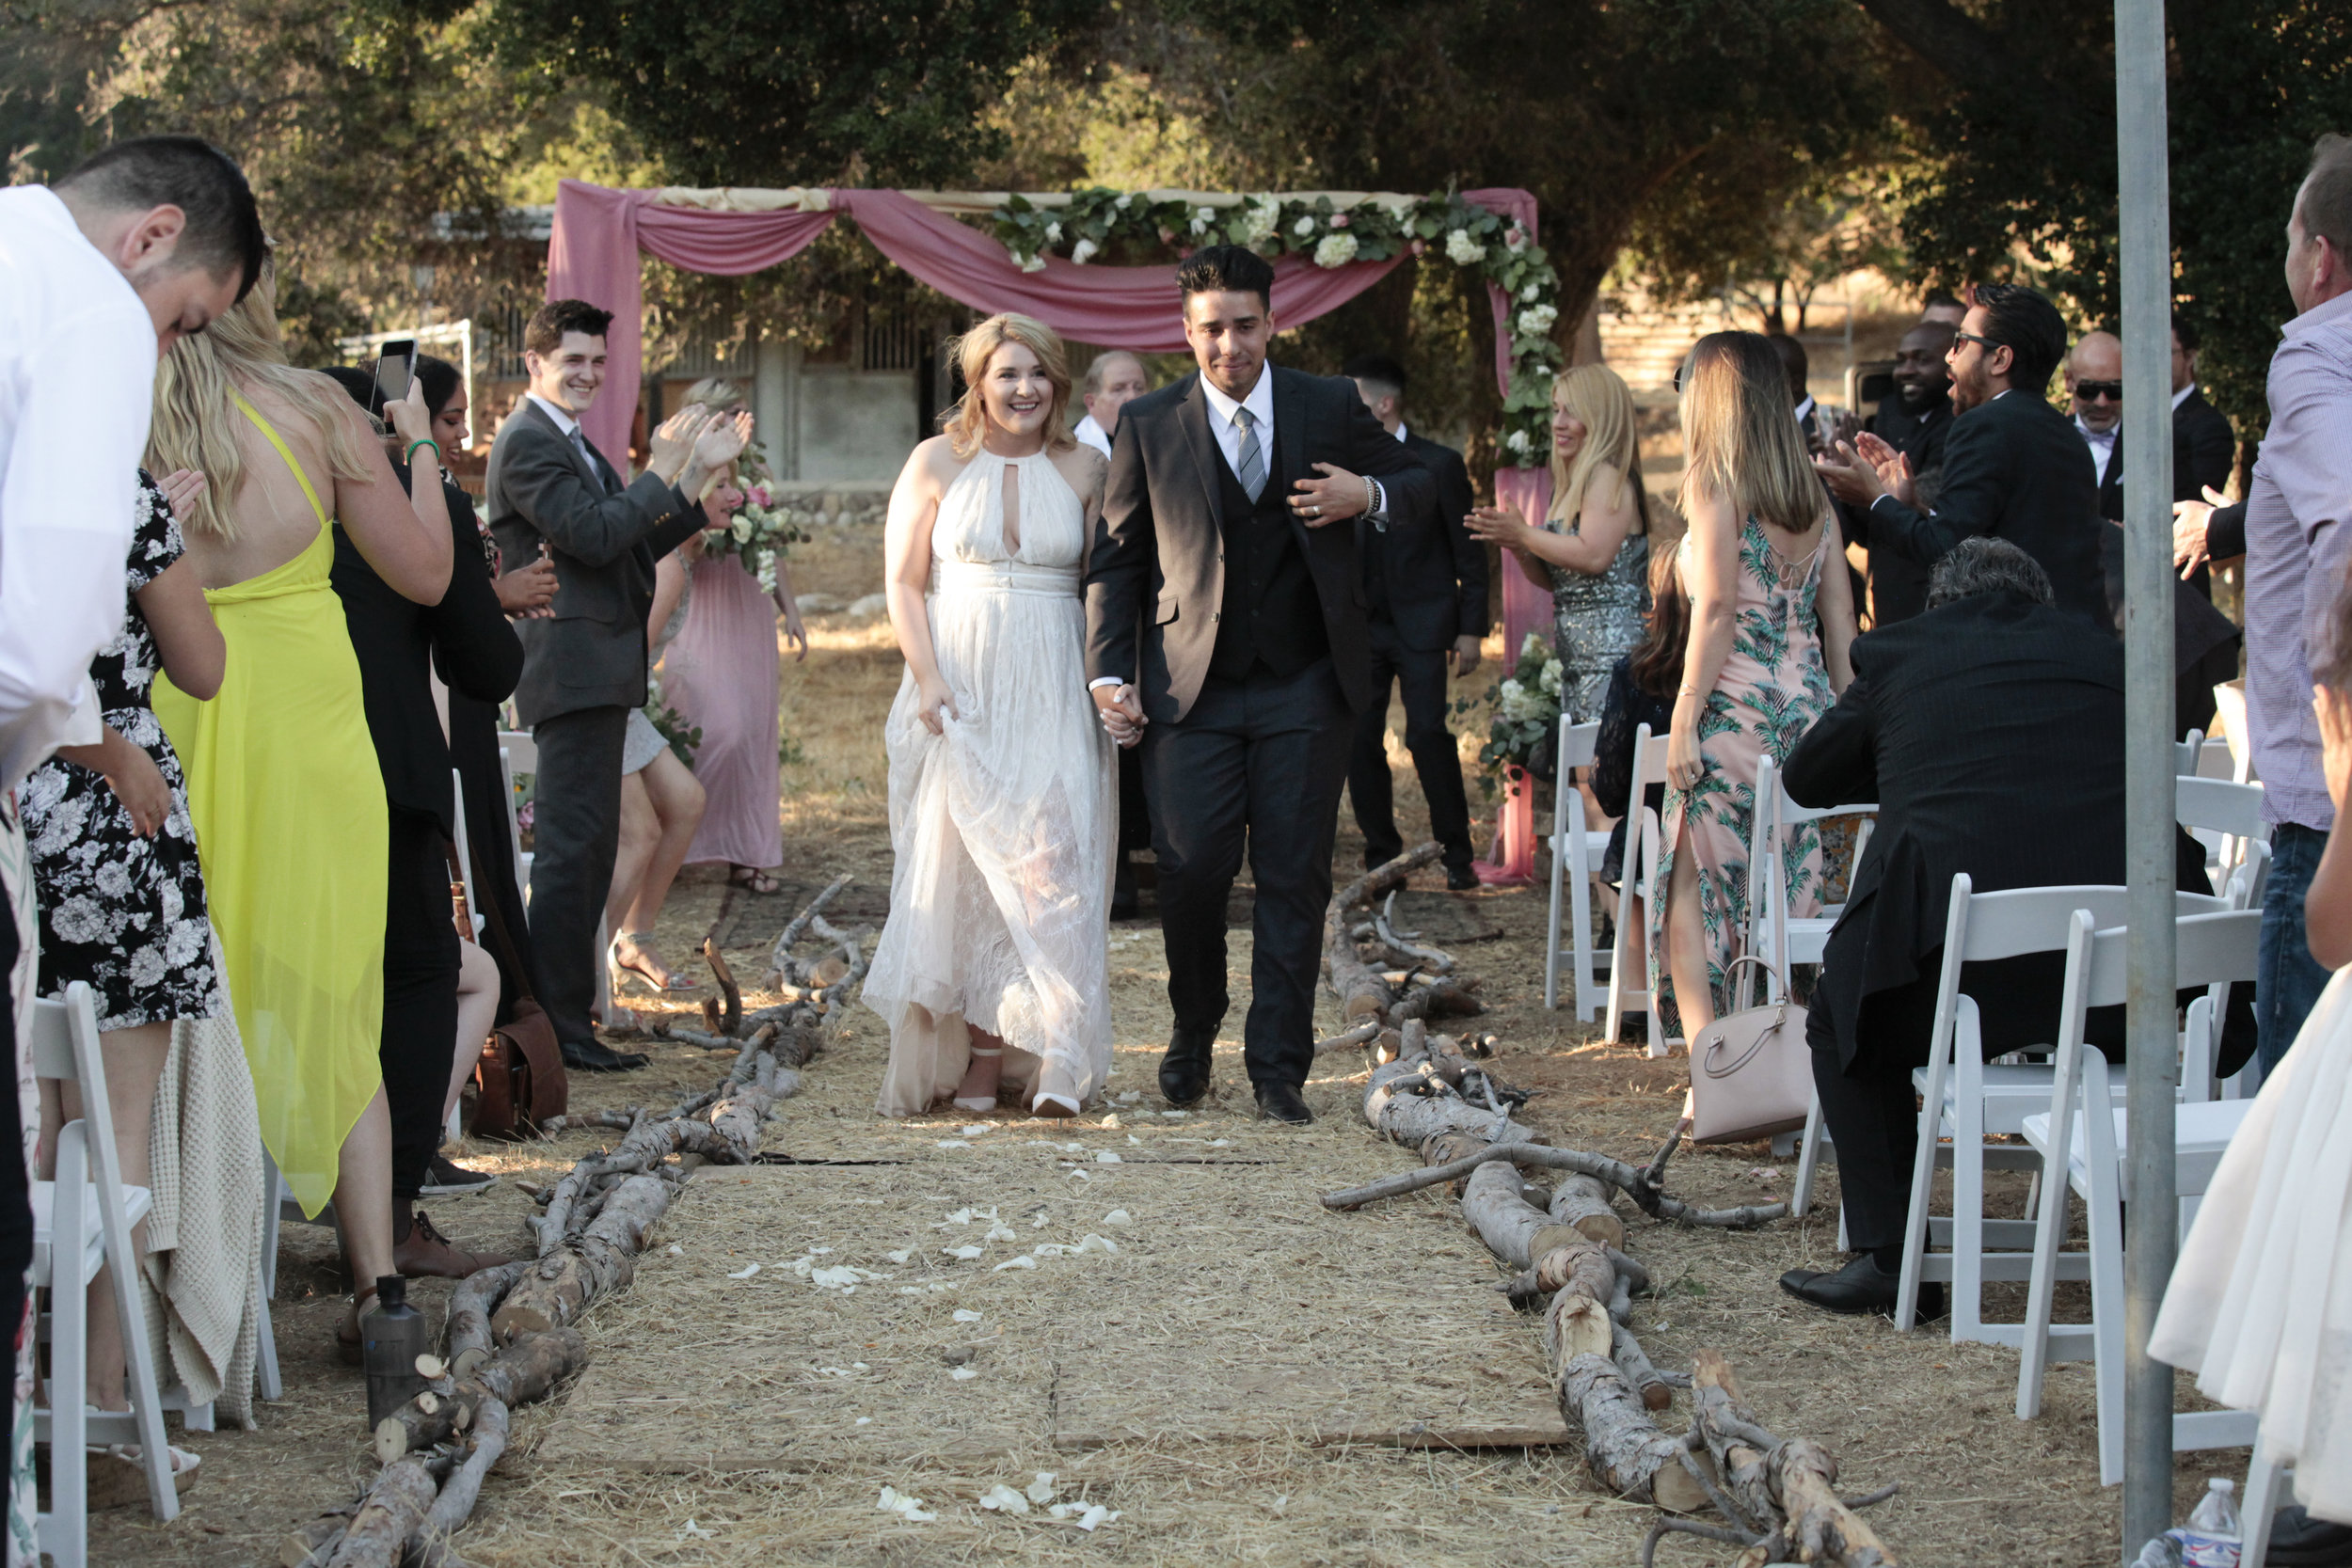 stephanieXmatt_wedding_186.jpg